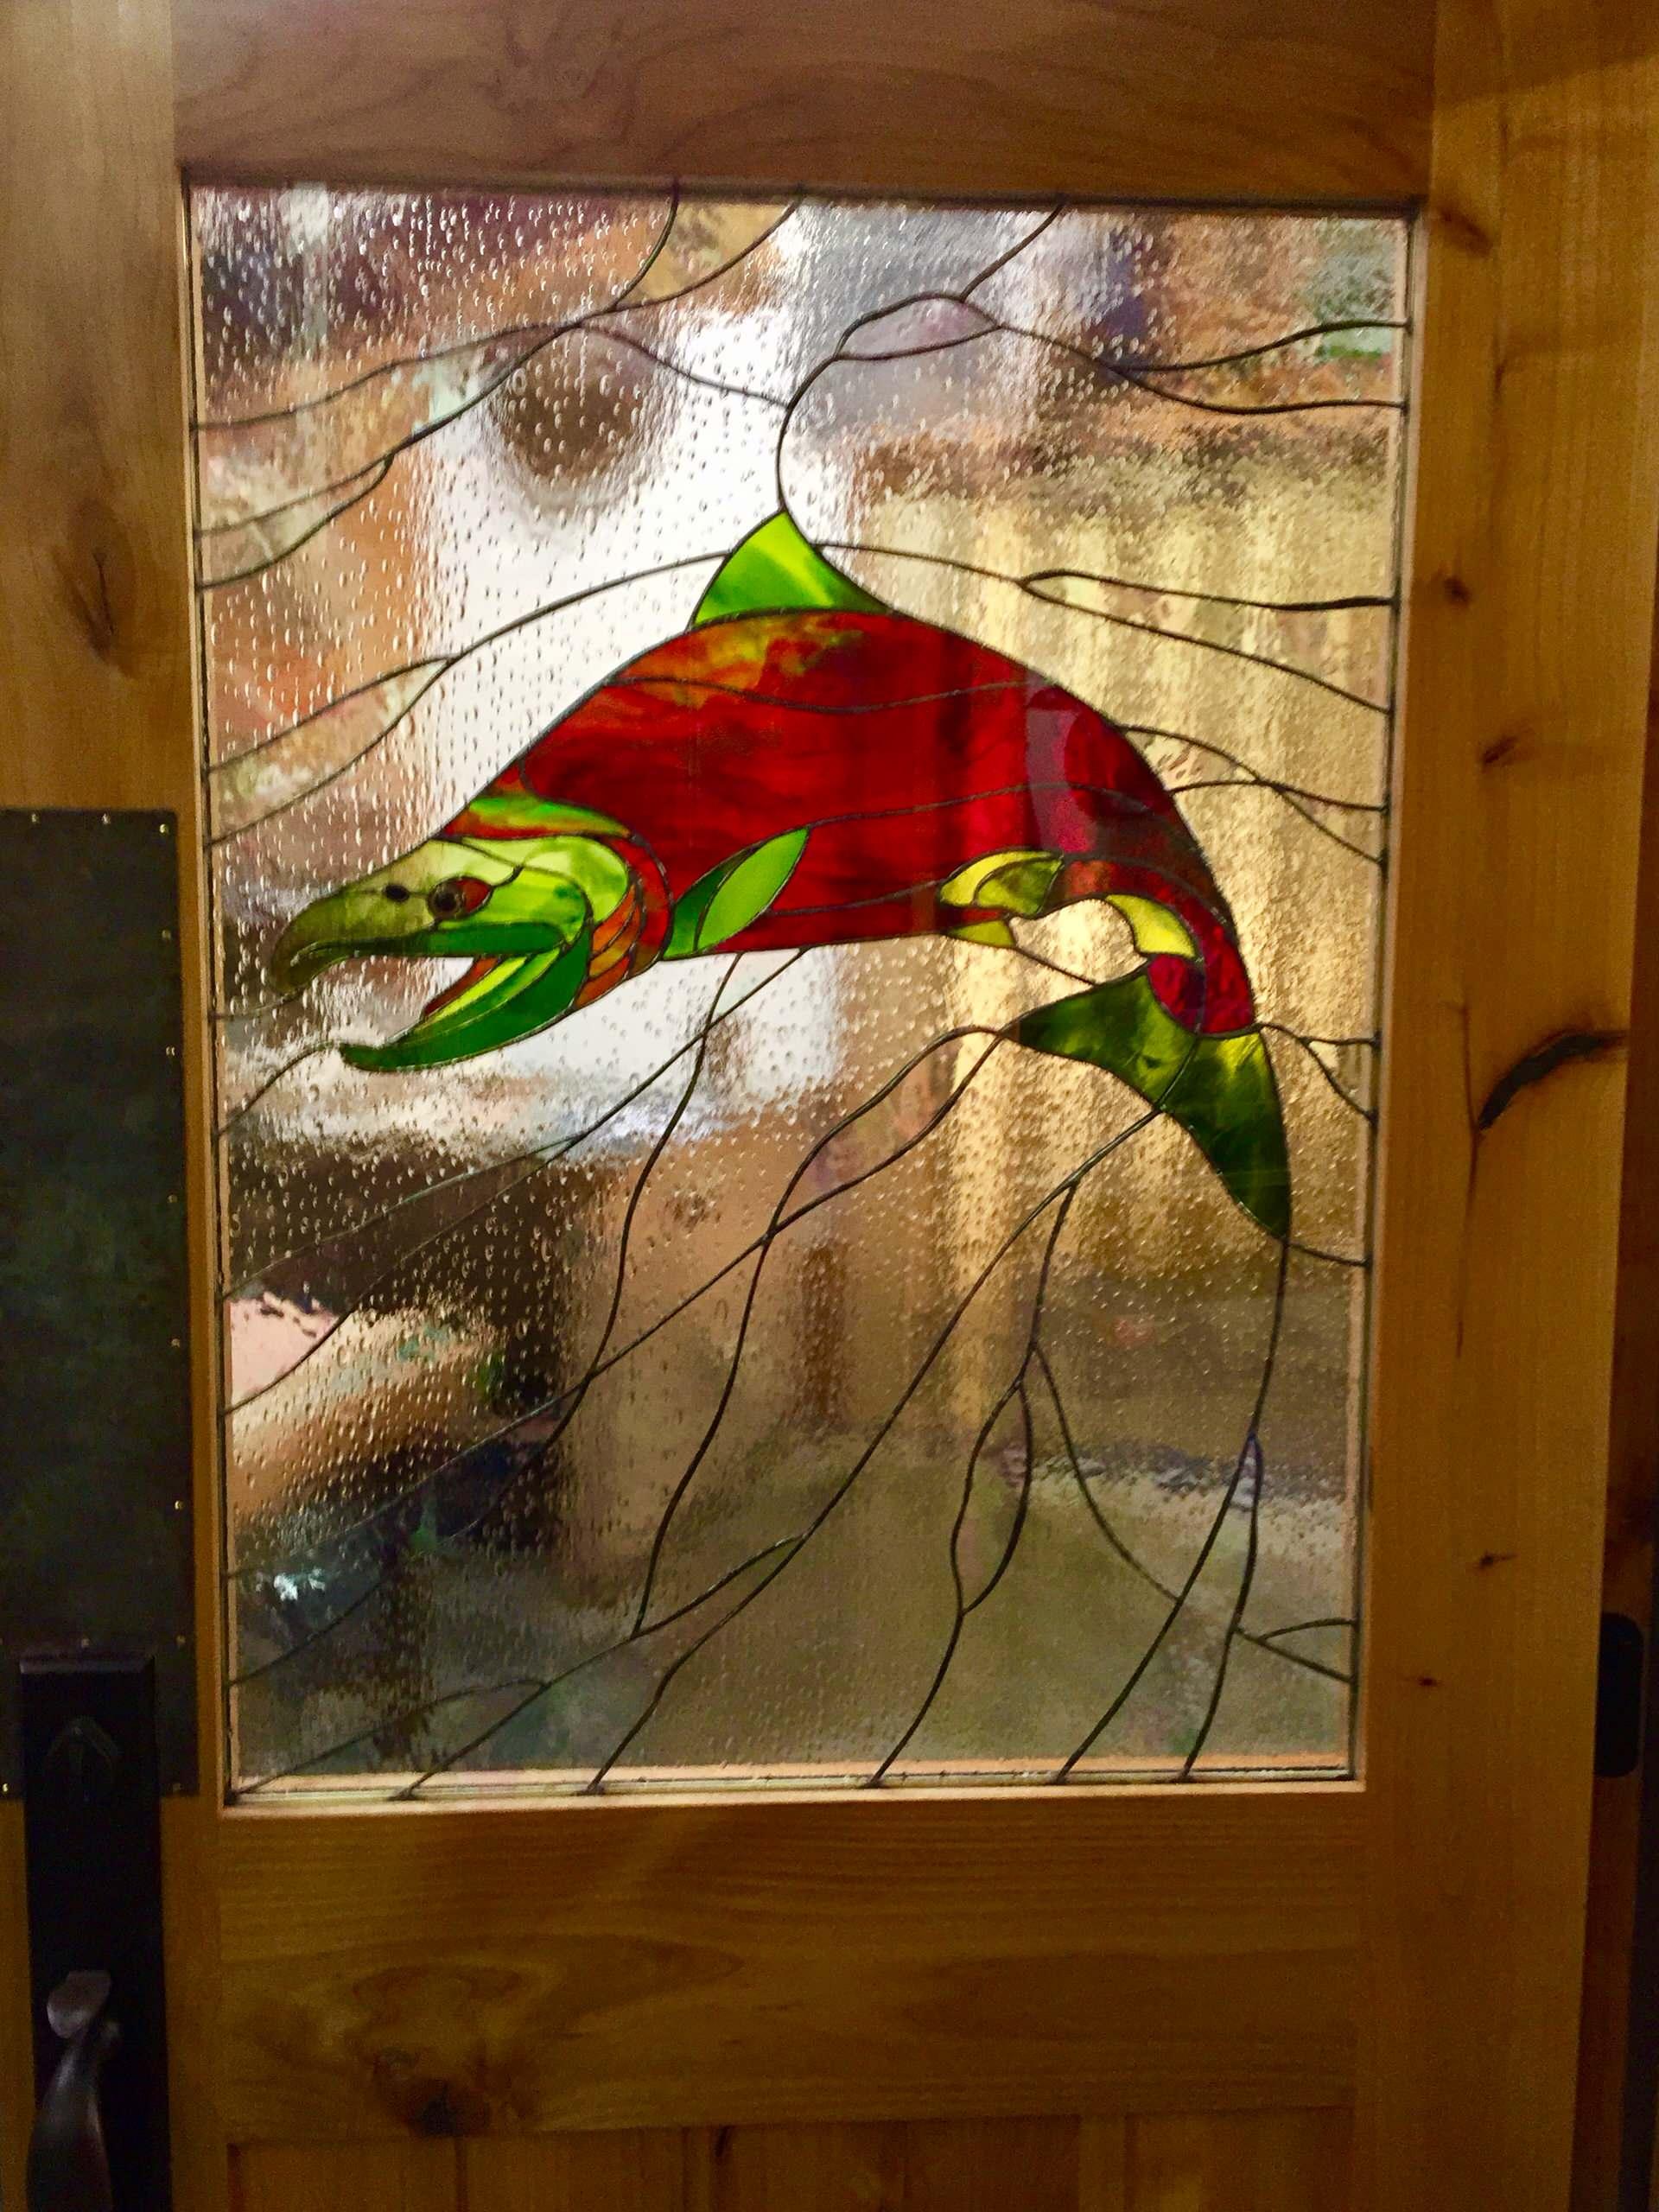 CRYSTAL CREEK LODGE, KING SALMON, ALASKA BY JAMES L. ZIEGLER, ARTISTIC GLASS AND